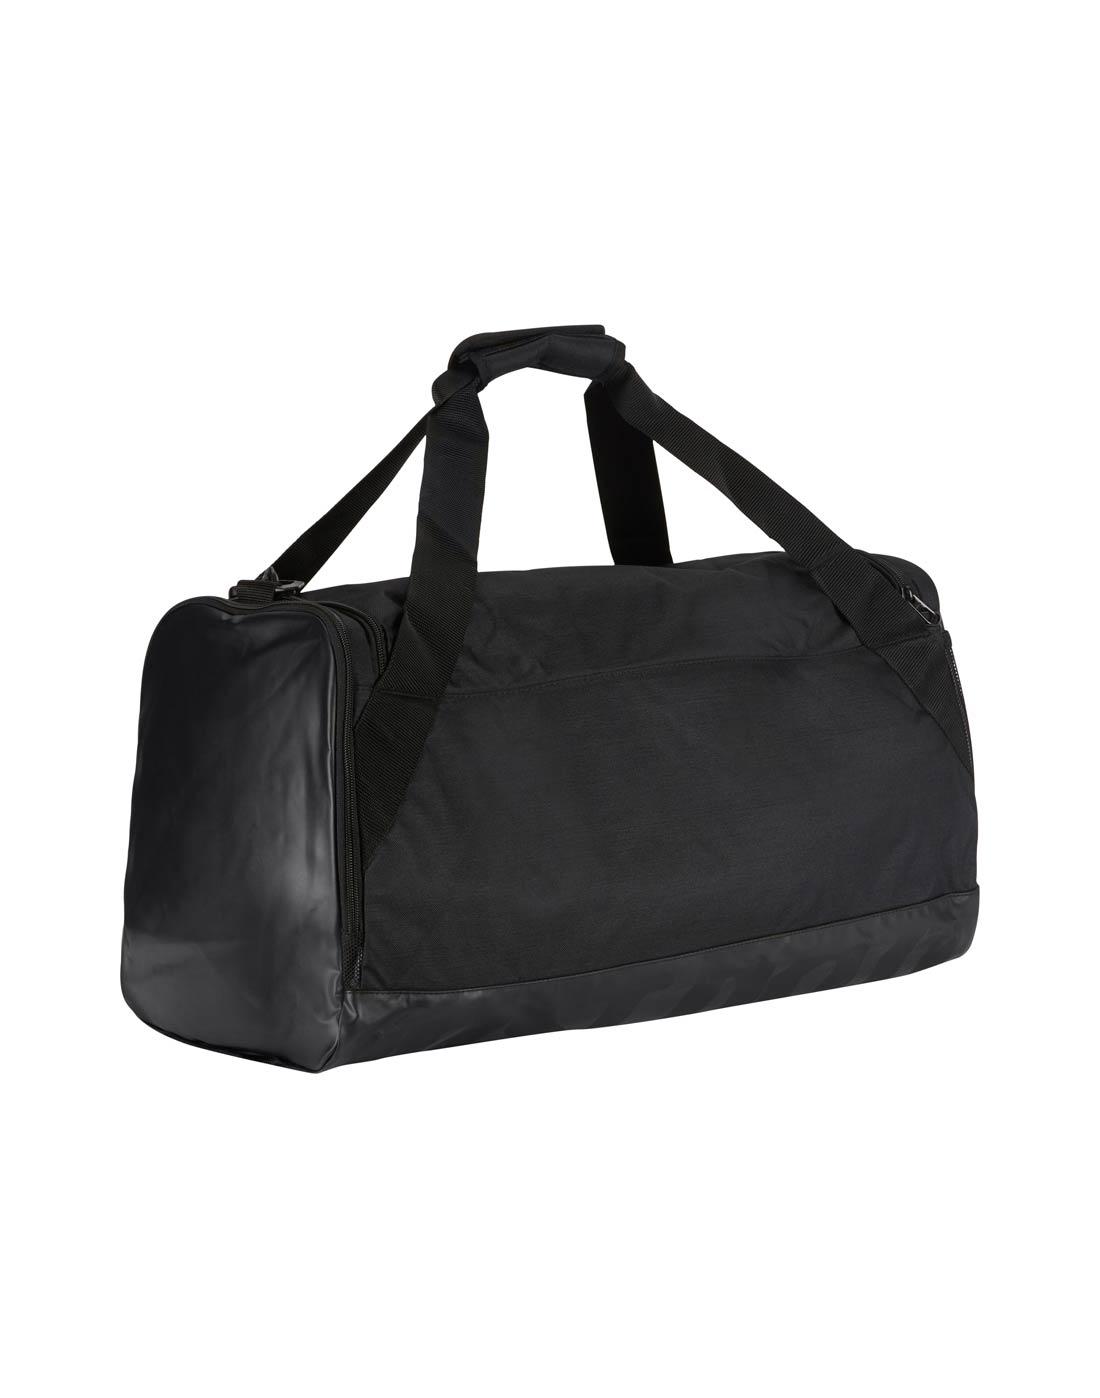 ae70385e9e Brasilia Medium Duffel Bag · Brasilia Medium Duffel Bag